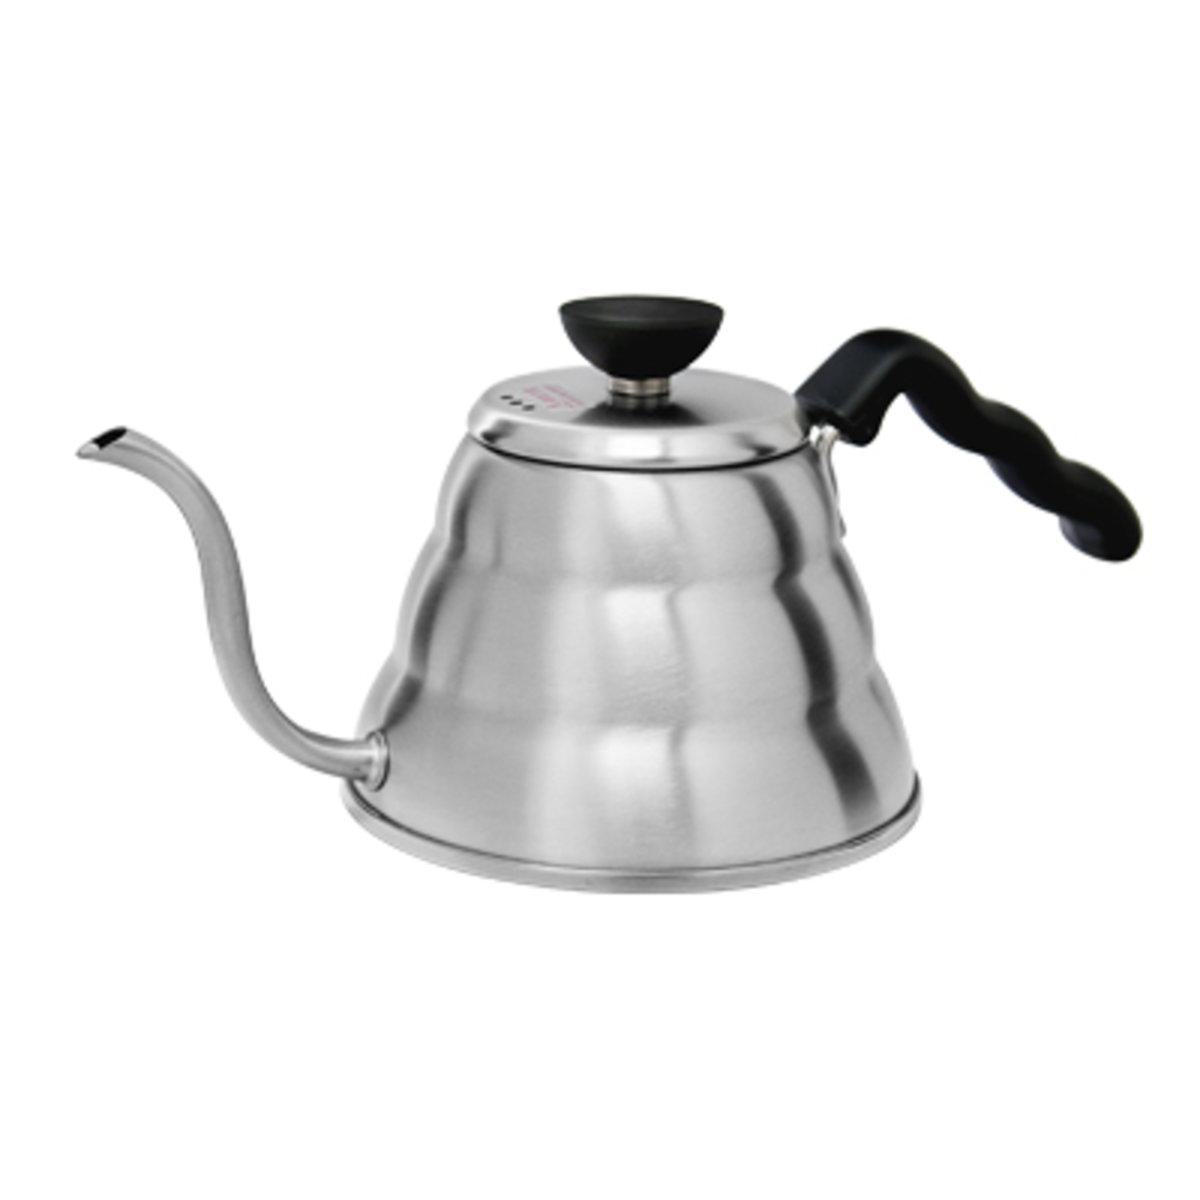 600ML COFFEE DRIP KETTLE BUONO